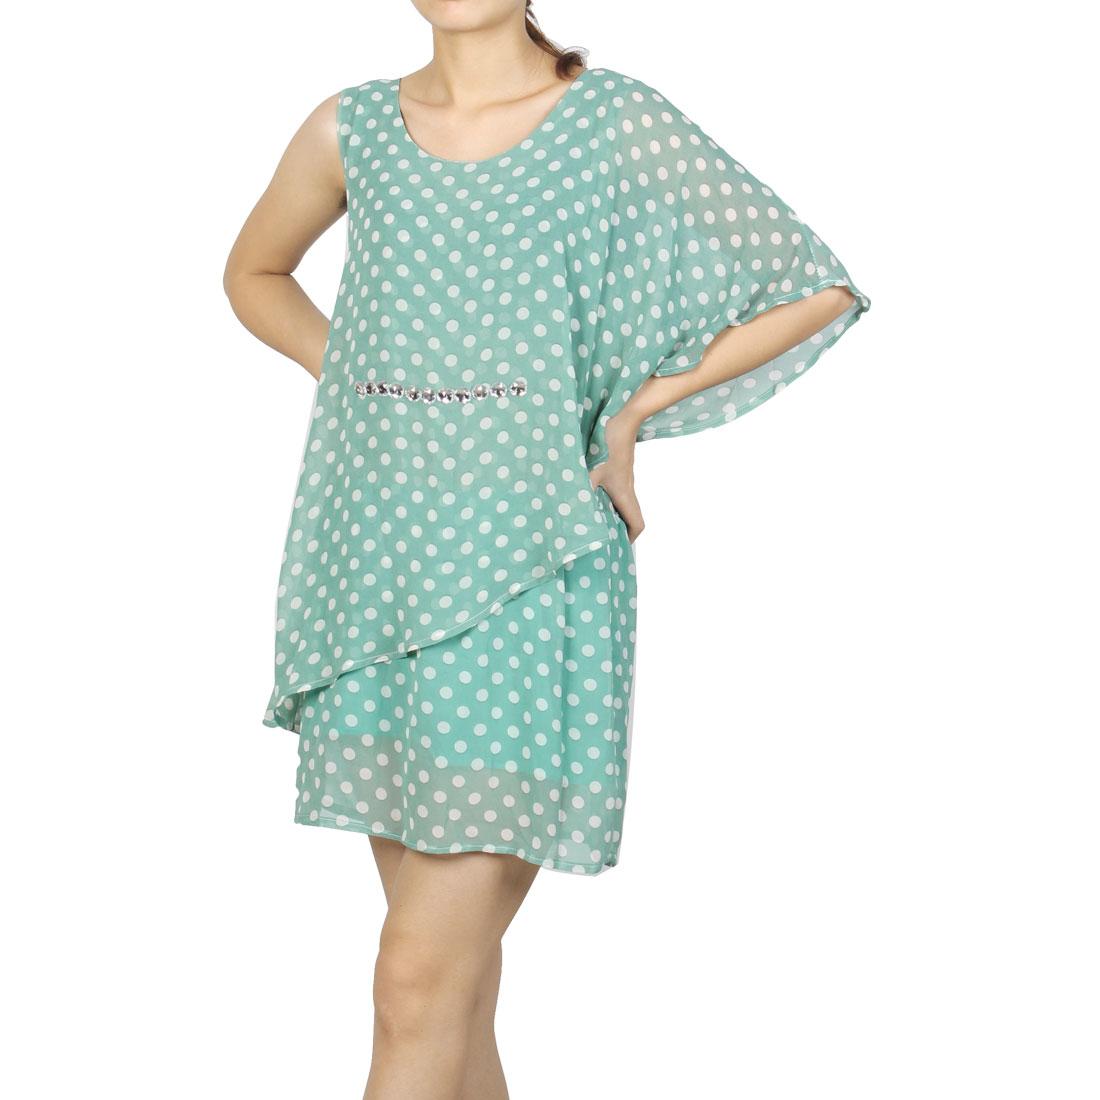 Women Round Neck Green White Dots Print Casual Chiffon Dress XS